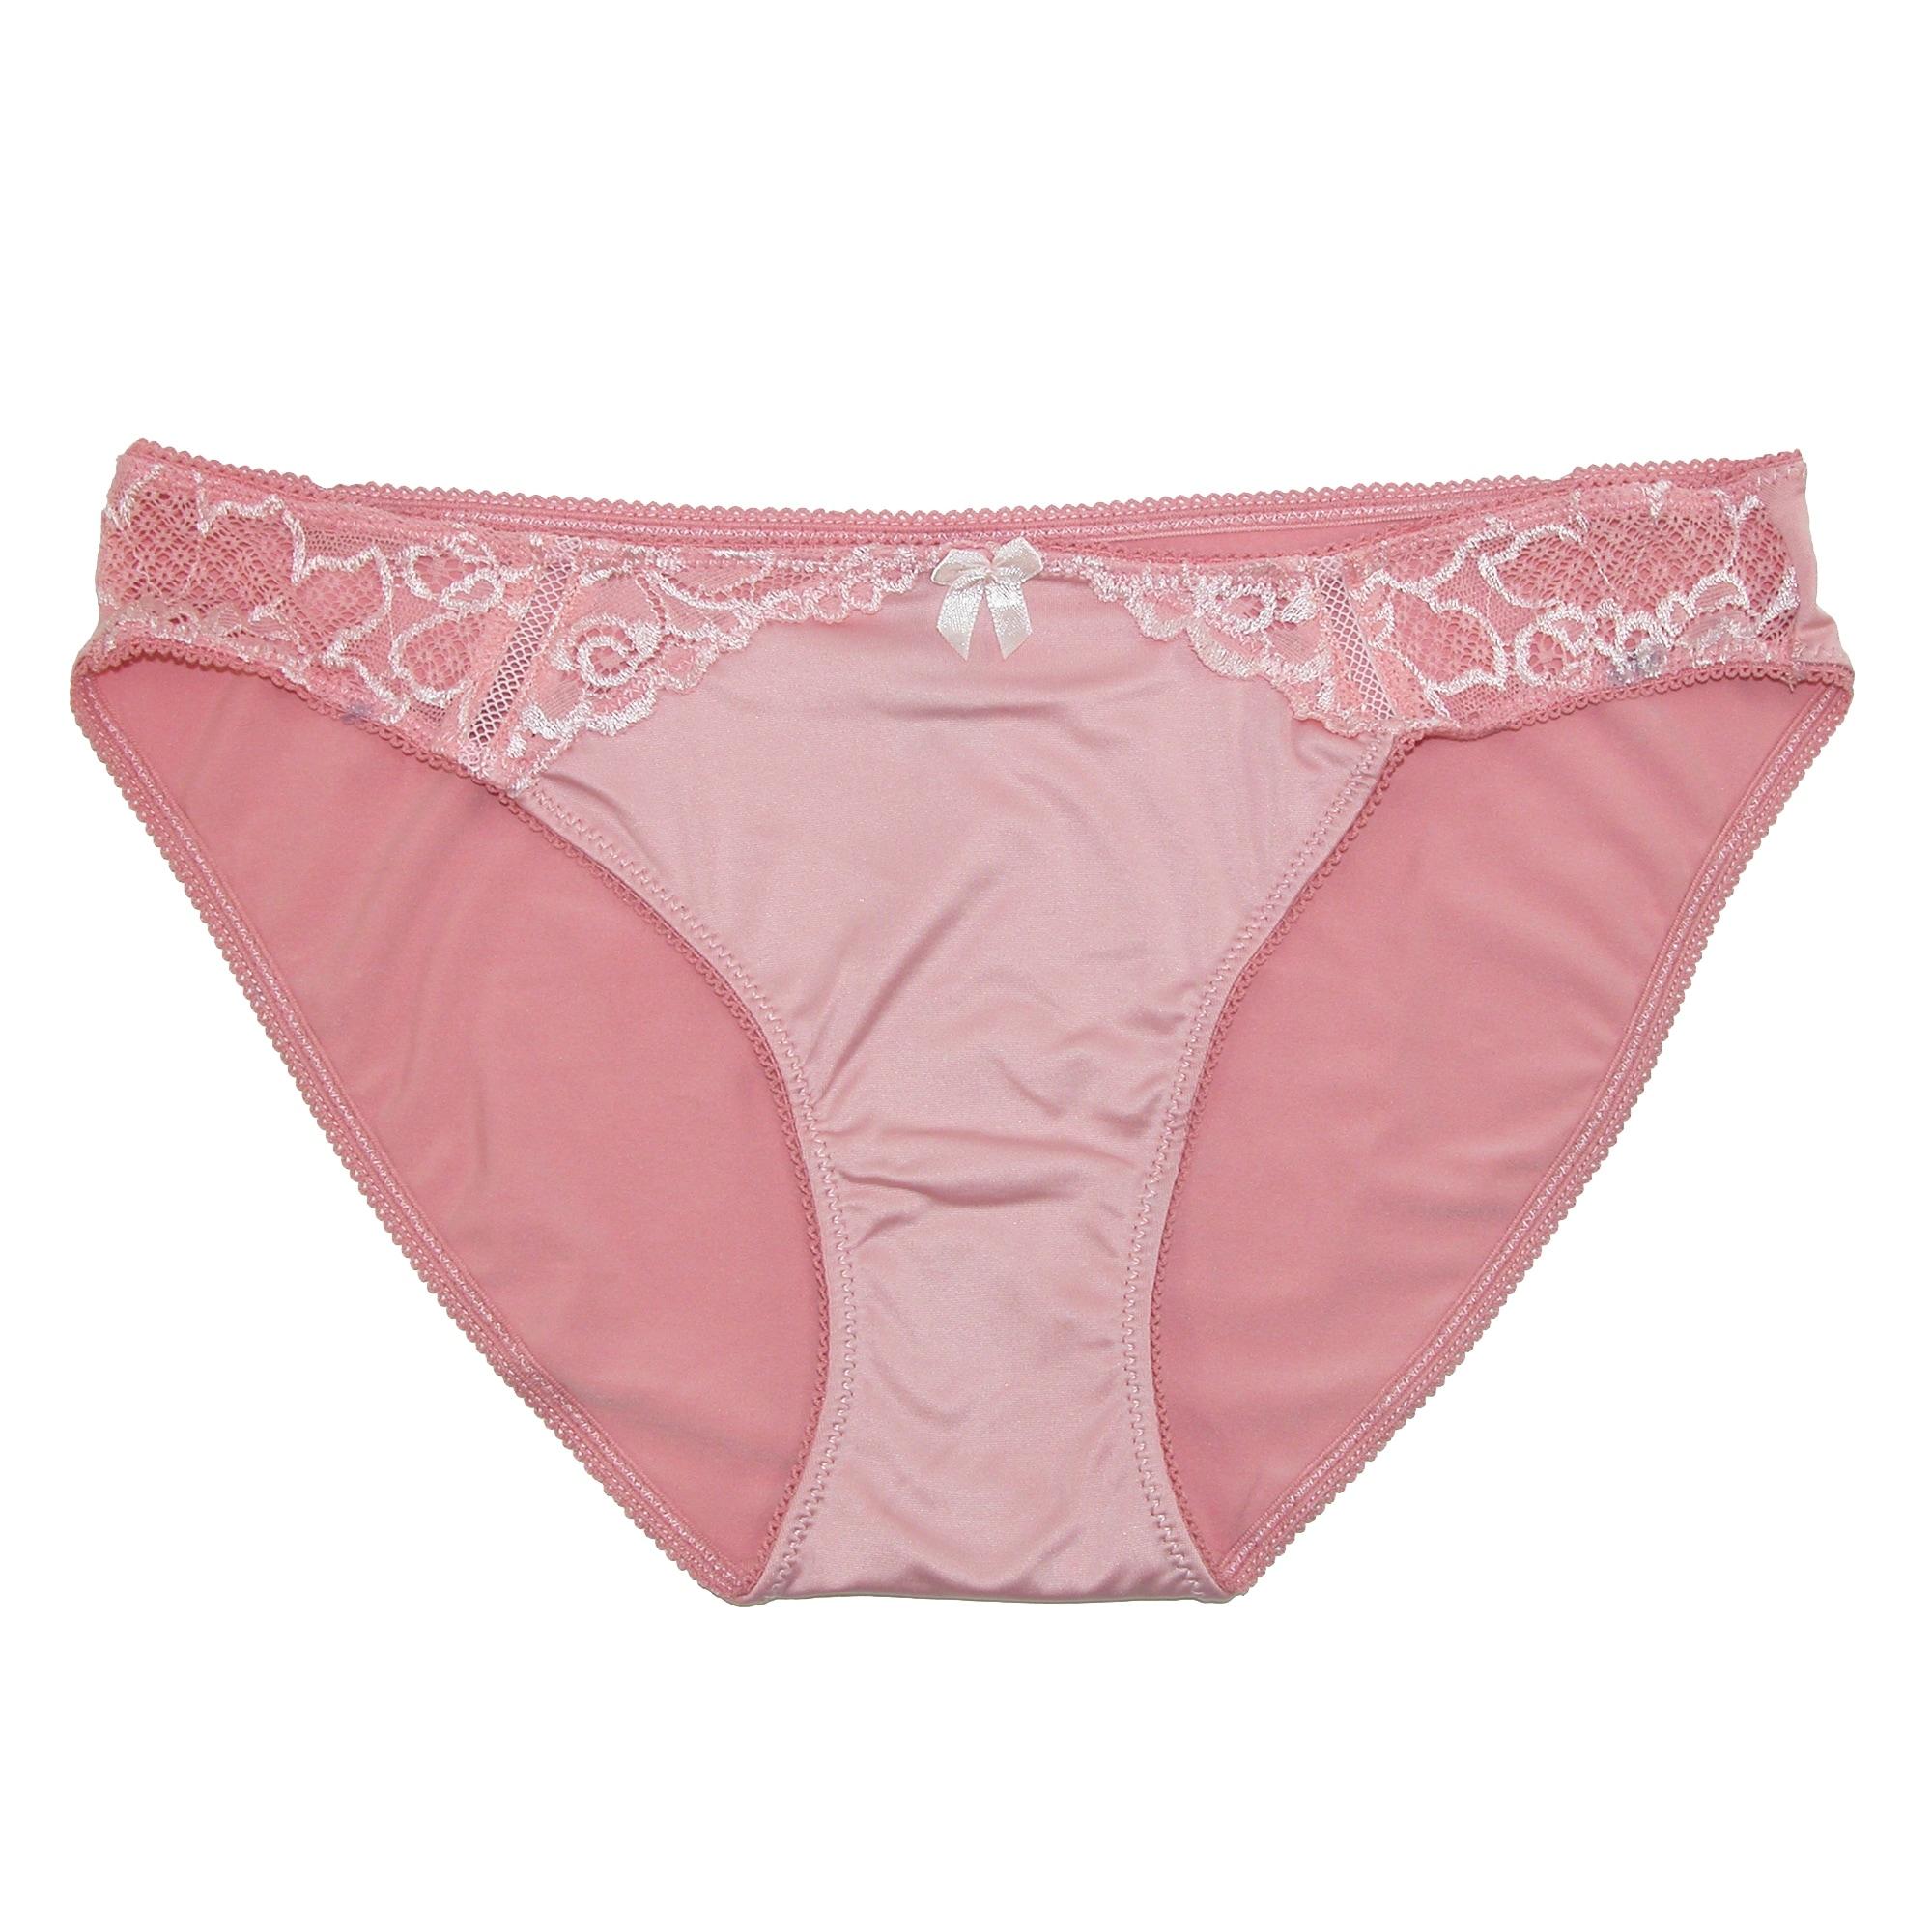 3caa9bddbbf6 Shop Rene Rofe Women's Lace Trim Bikini Underwear (Pack of 2) - Free  Shipping On Orders Over $45 - Overstock - 14294981